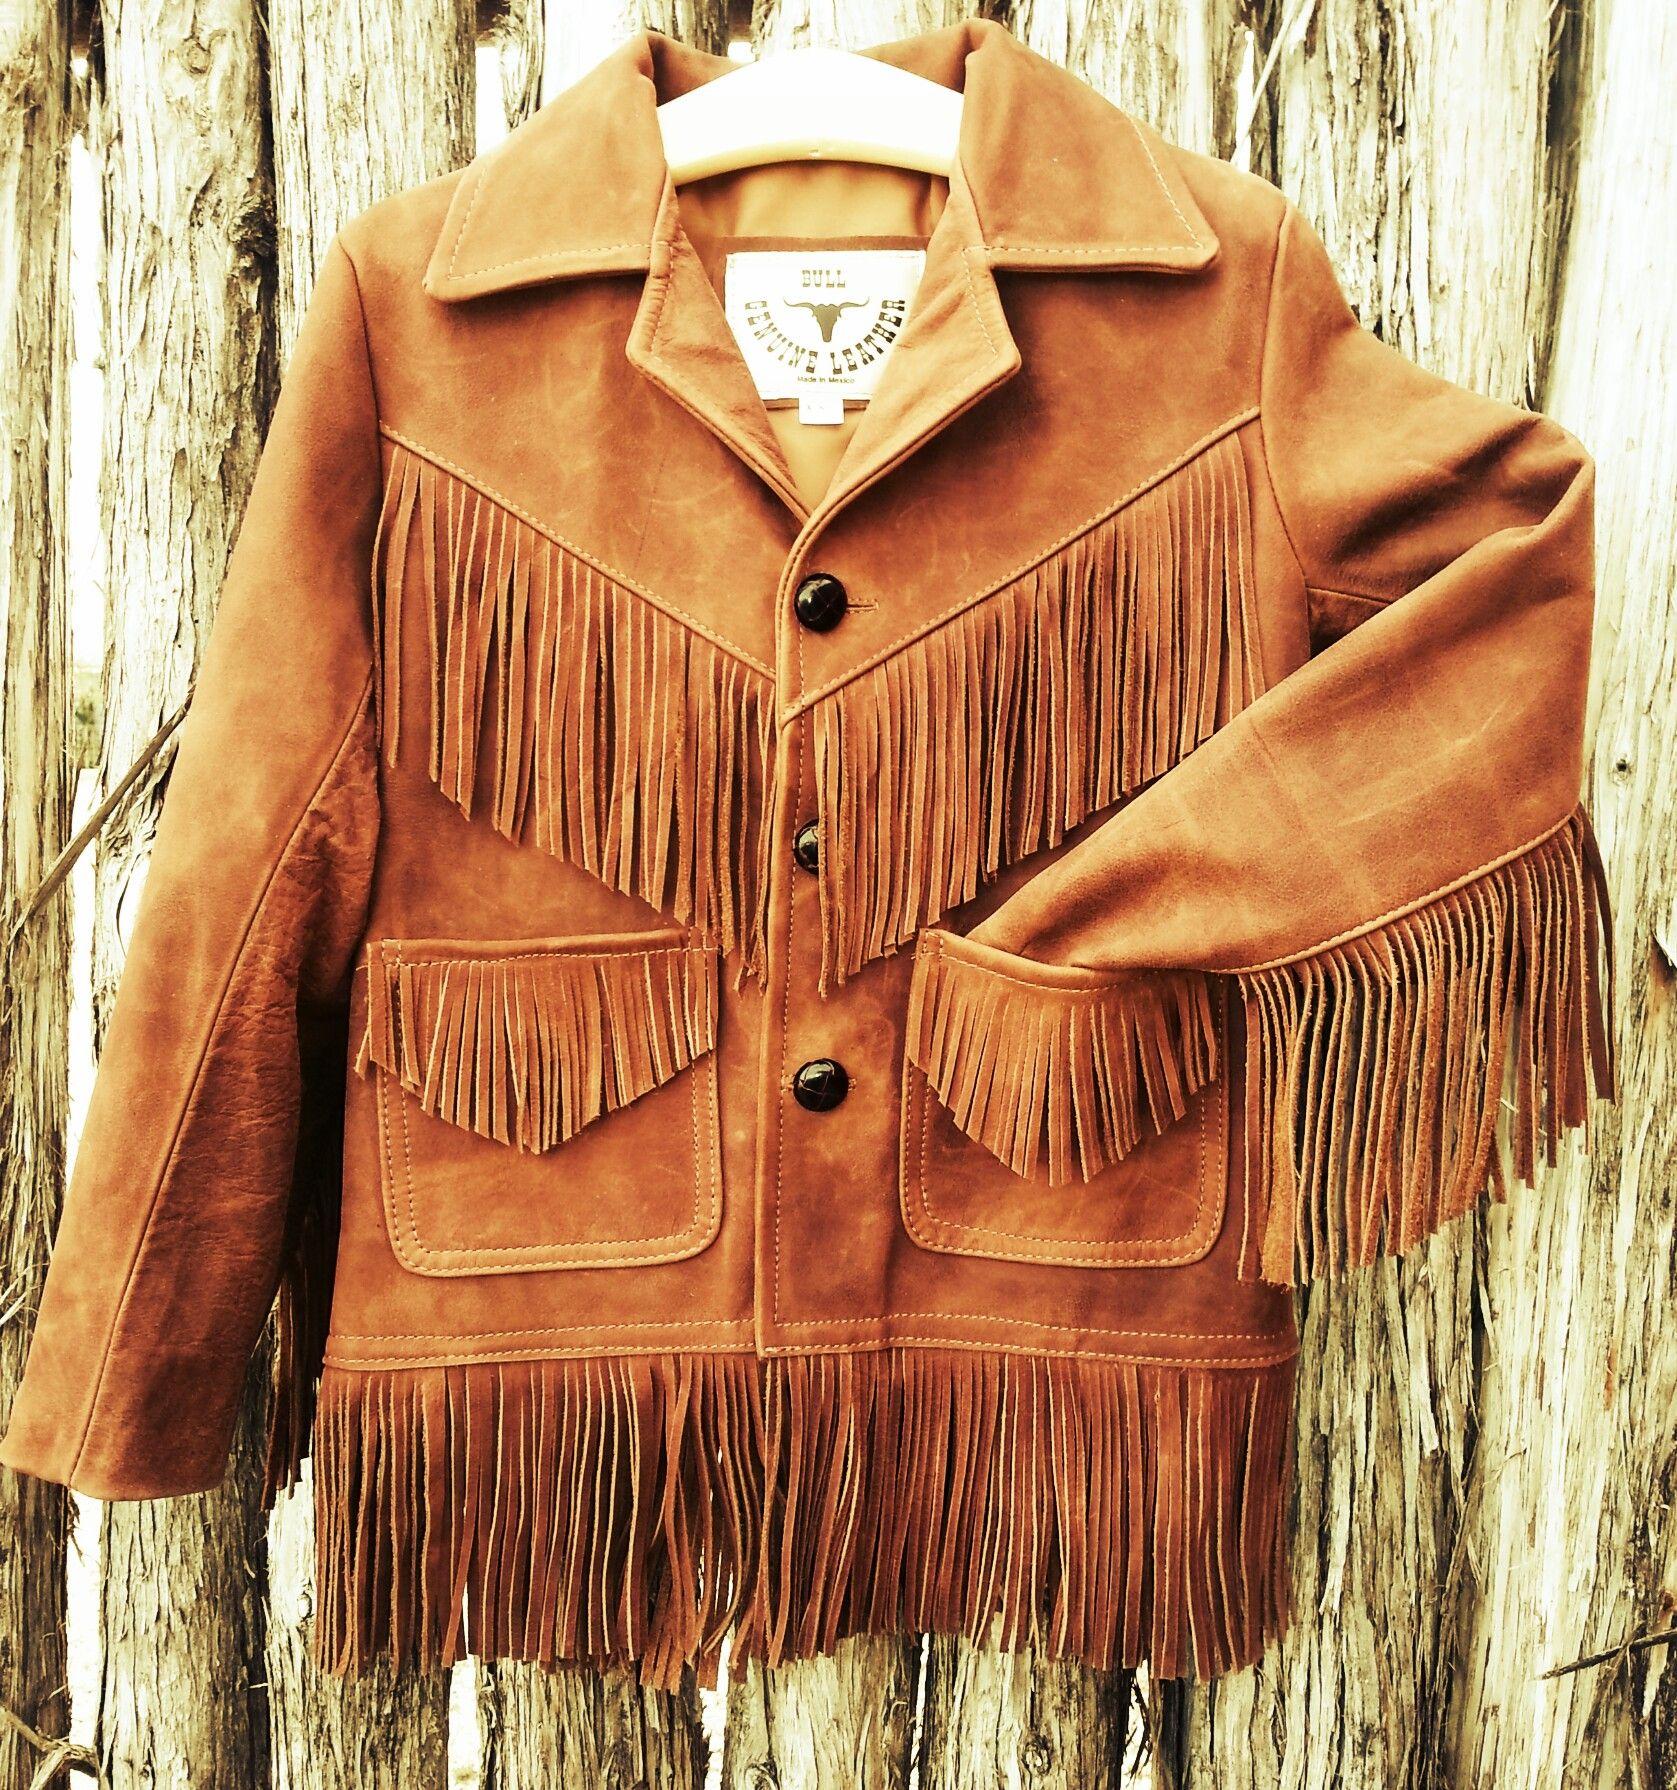 Kid S Brown Leather Fringe Jacket Go To Www Bootbabyranch Com Fringe Leather Jacket Western Outfits Western Fashion [ 1790 x 1677 Pixel ]